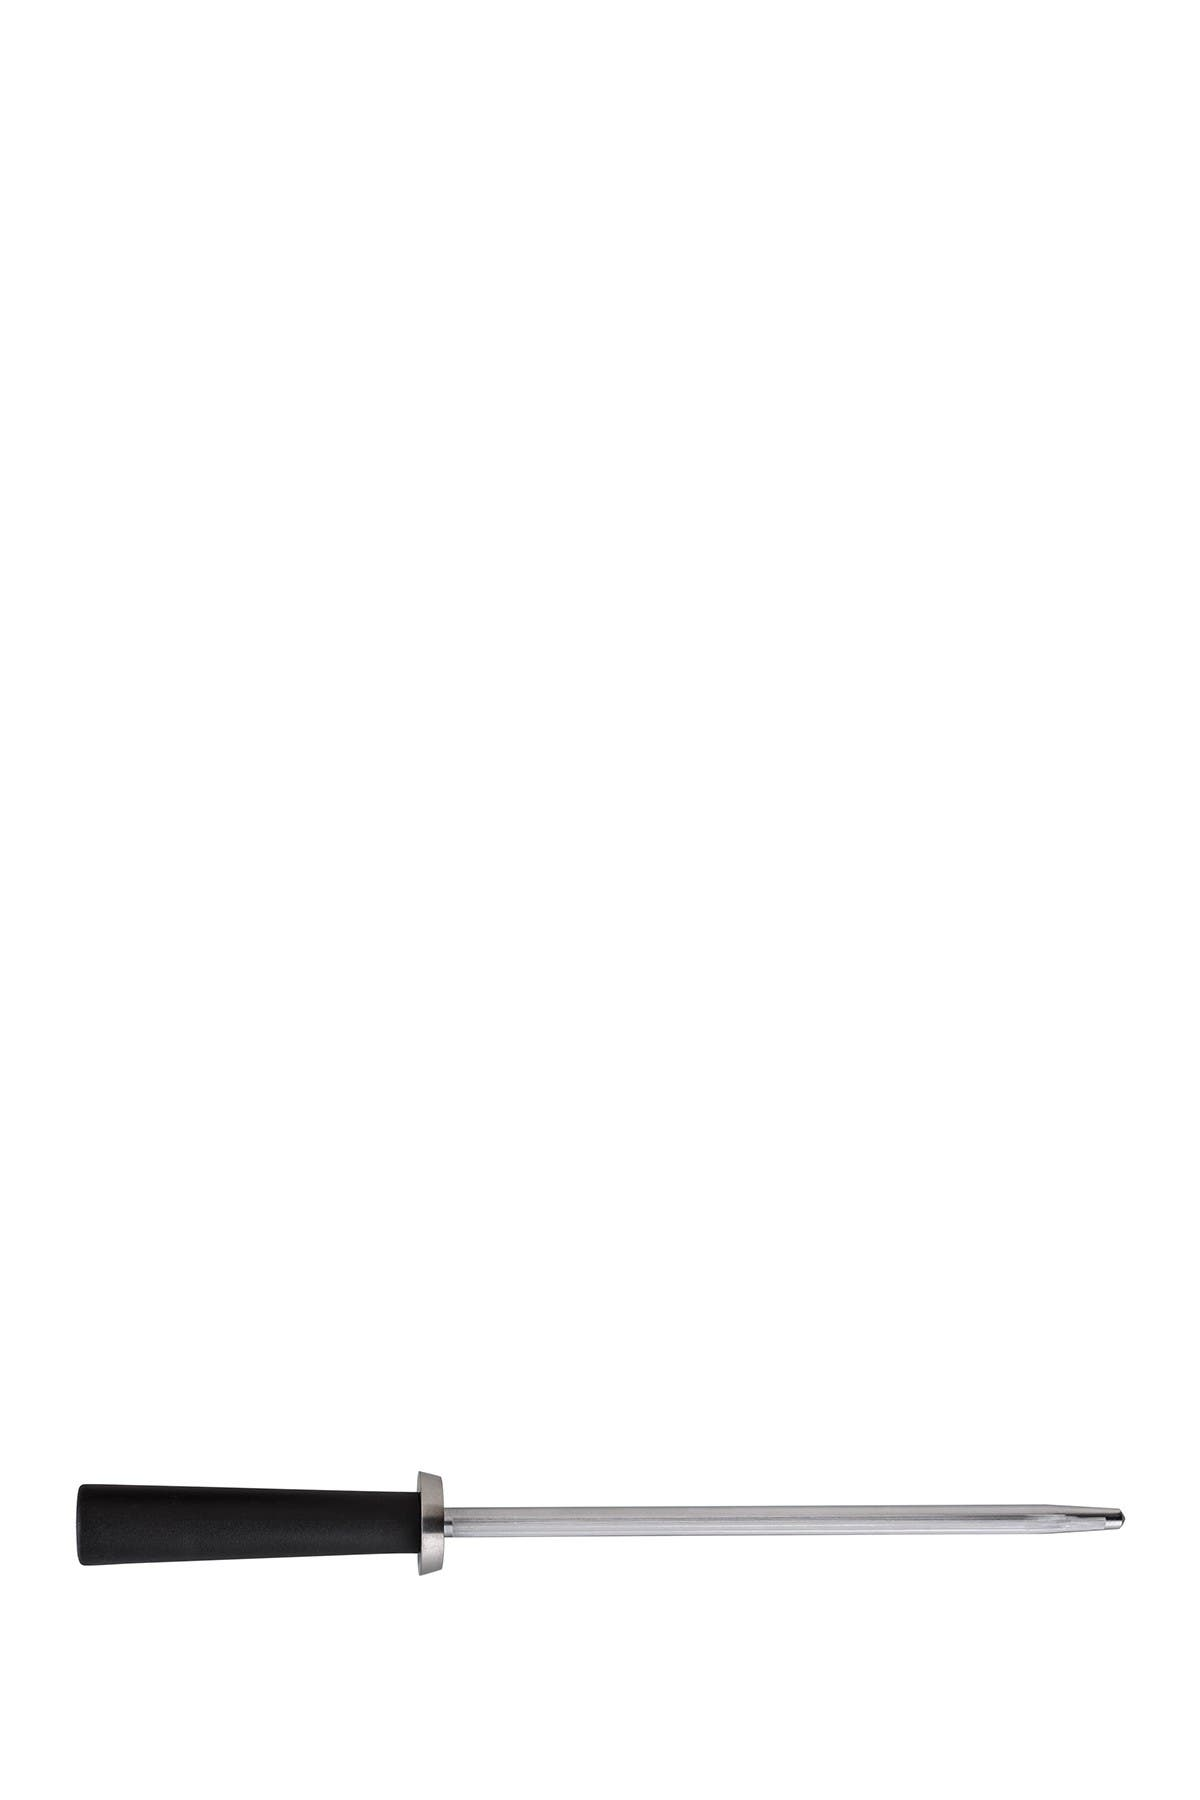 "Image of Shun Cutlery Sora 9"" Combination Honing Steel"